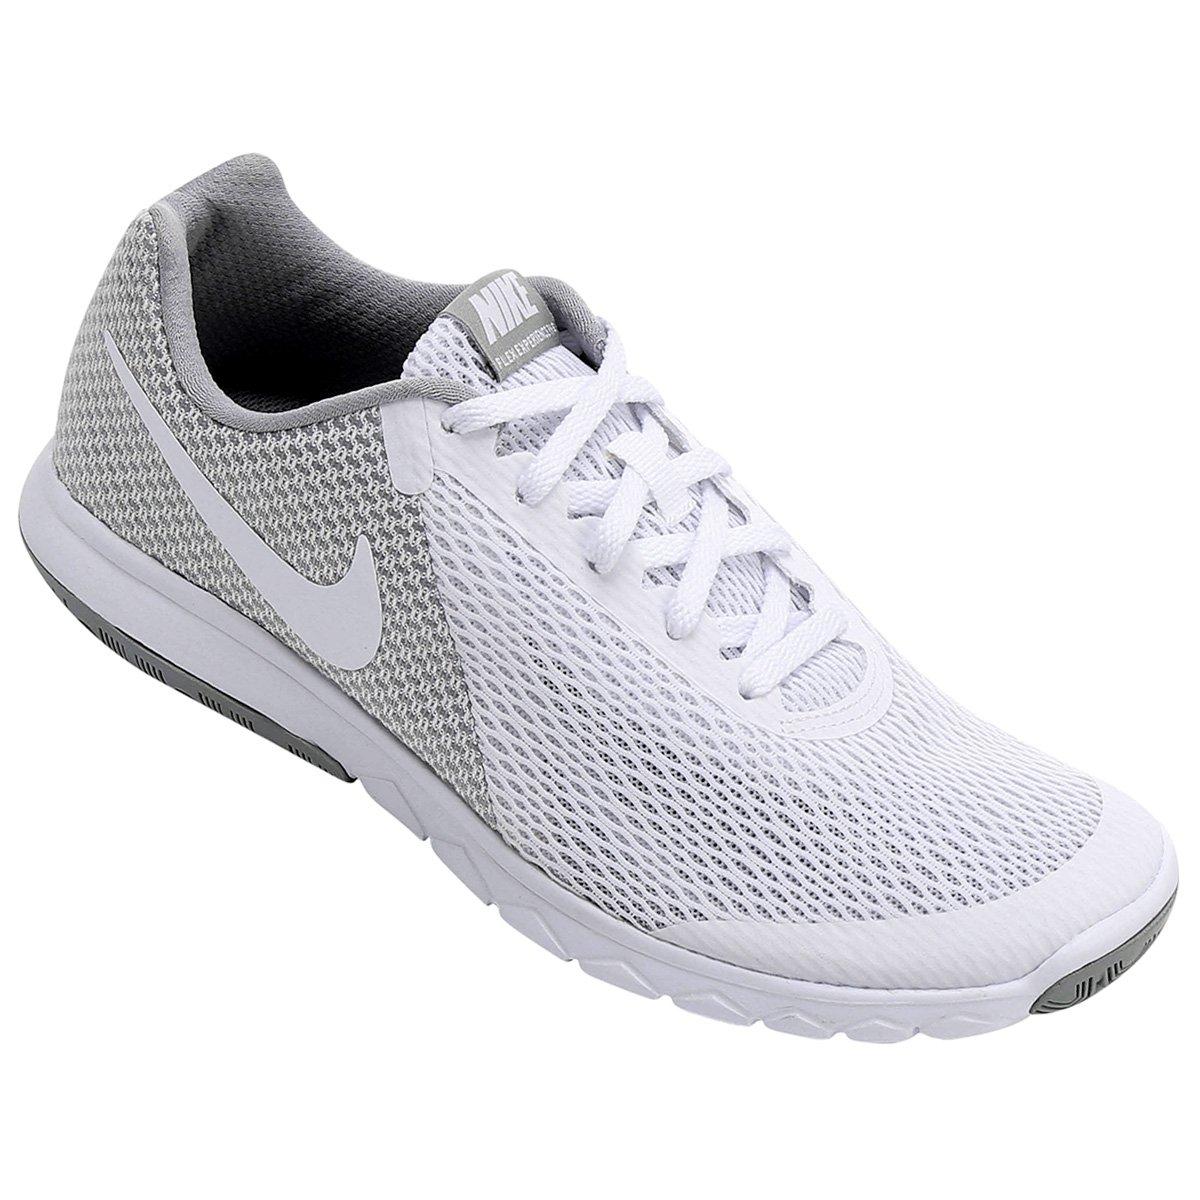 680f1455afc1e Tênis Nike Flex Experience Rn 6 Feminino - Branco e Cinza - Compre Agora